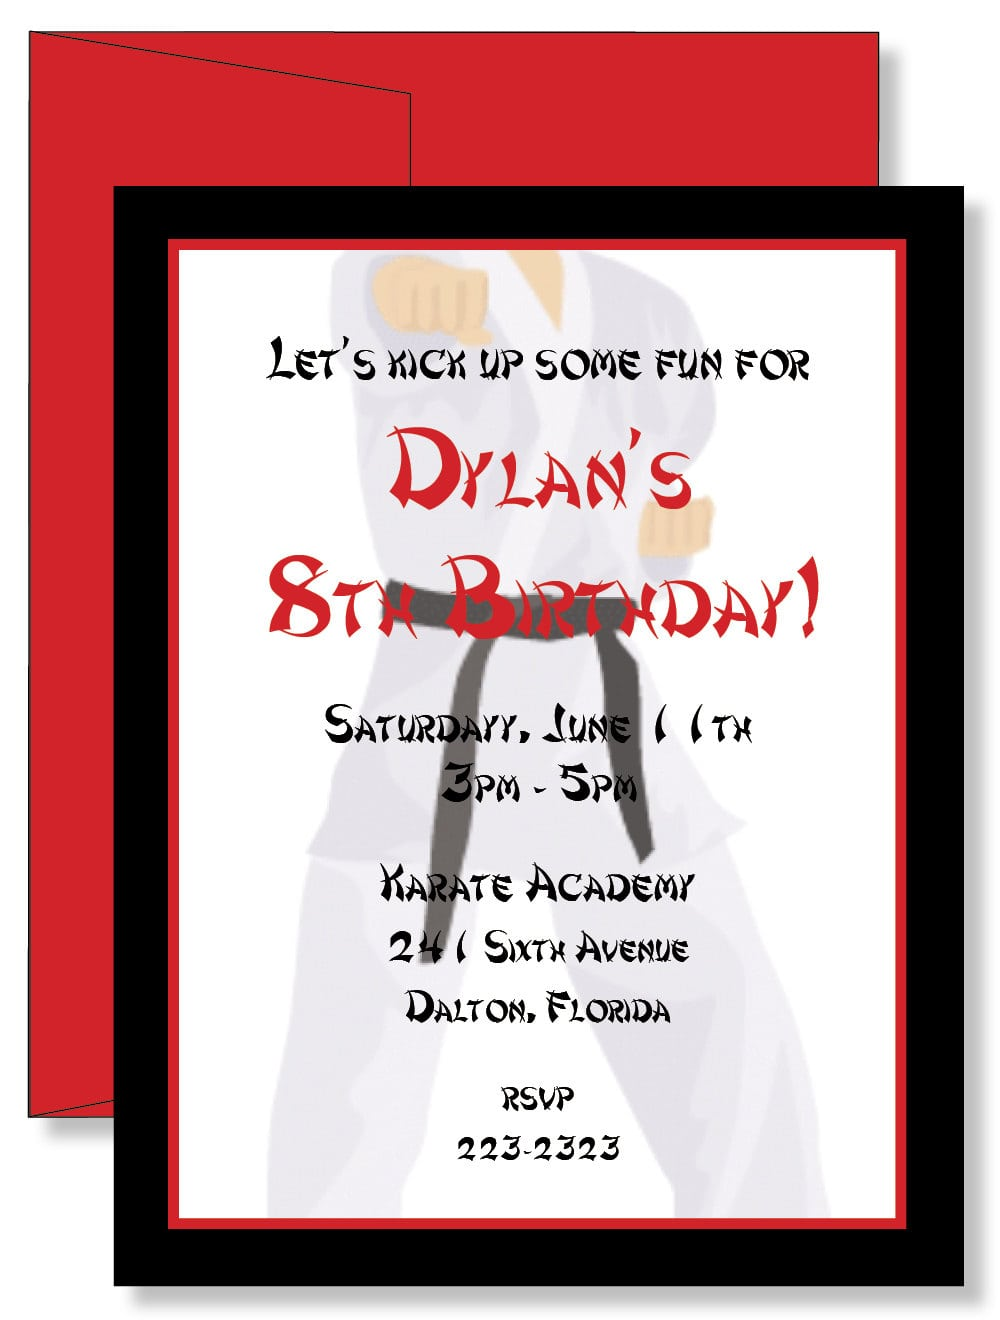 12 Custom Personalized Karate Birthday Party Invitations  $11 00